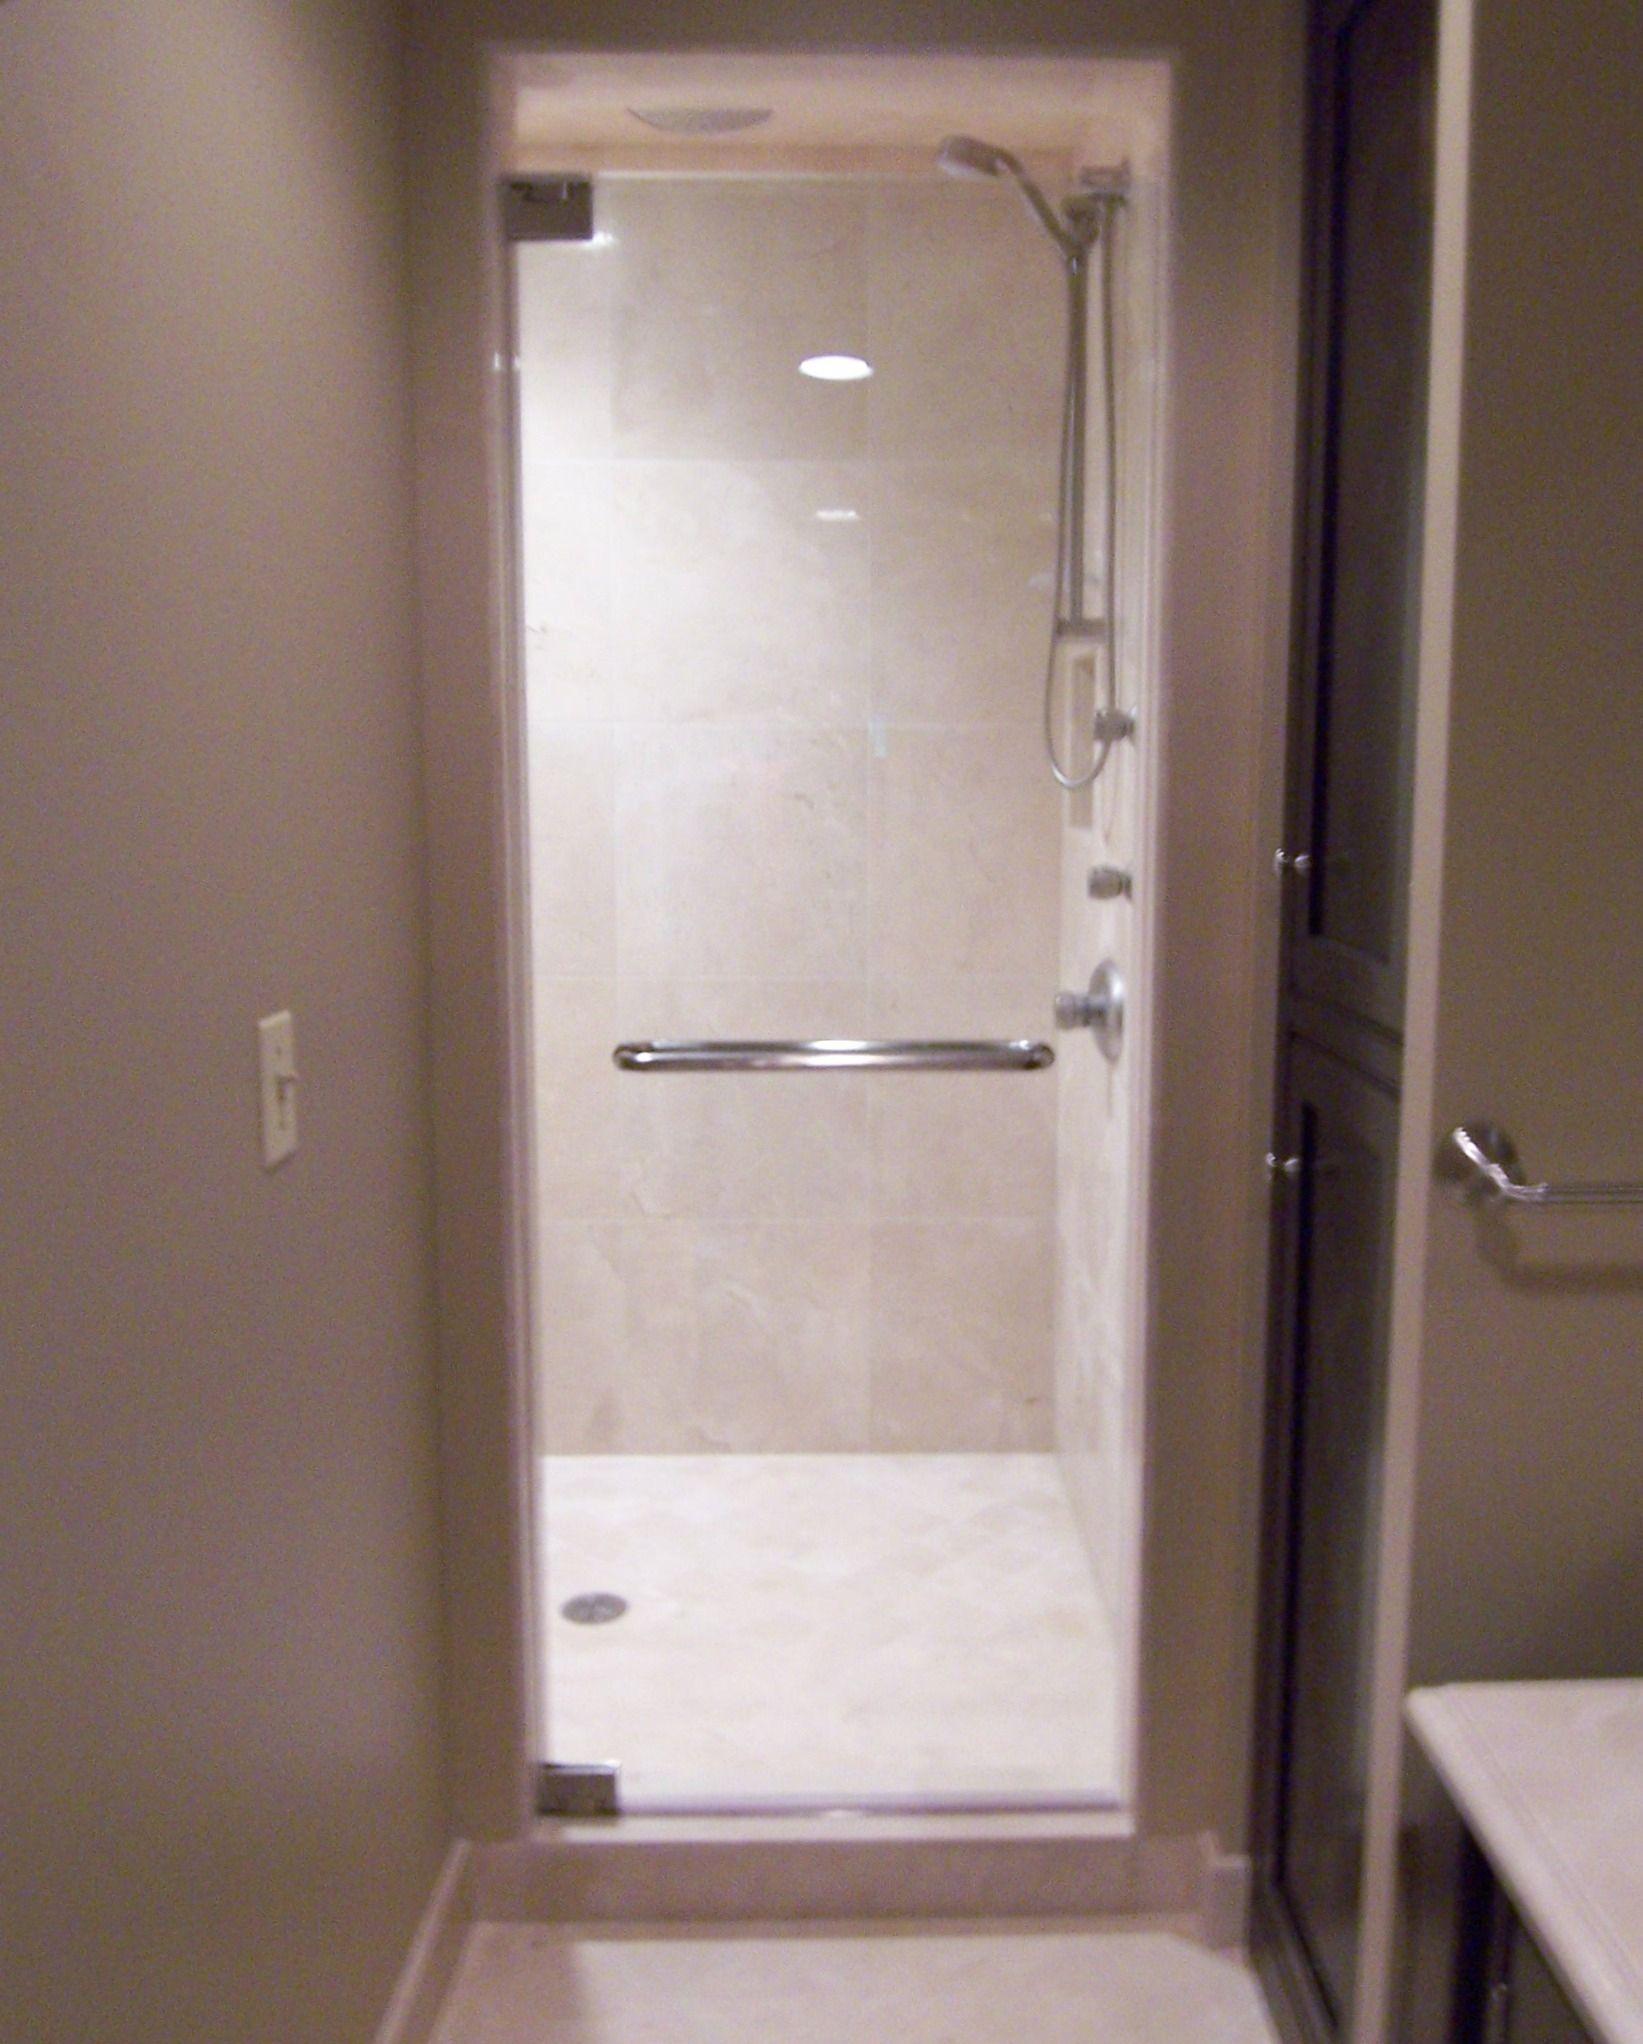 Single pivot glass shower door httpsourceabl pinterest single pivot glass shower door planetlyrics Choice Image